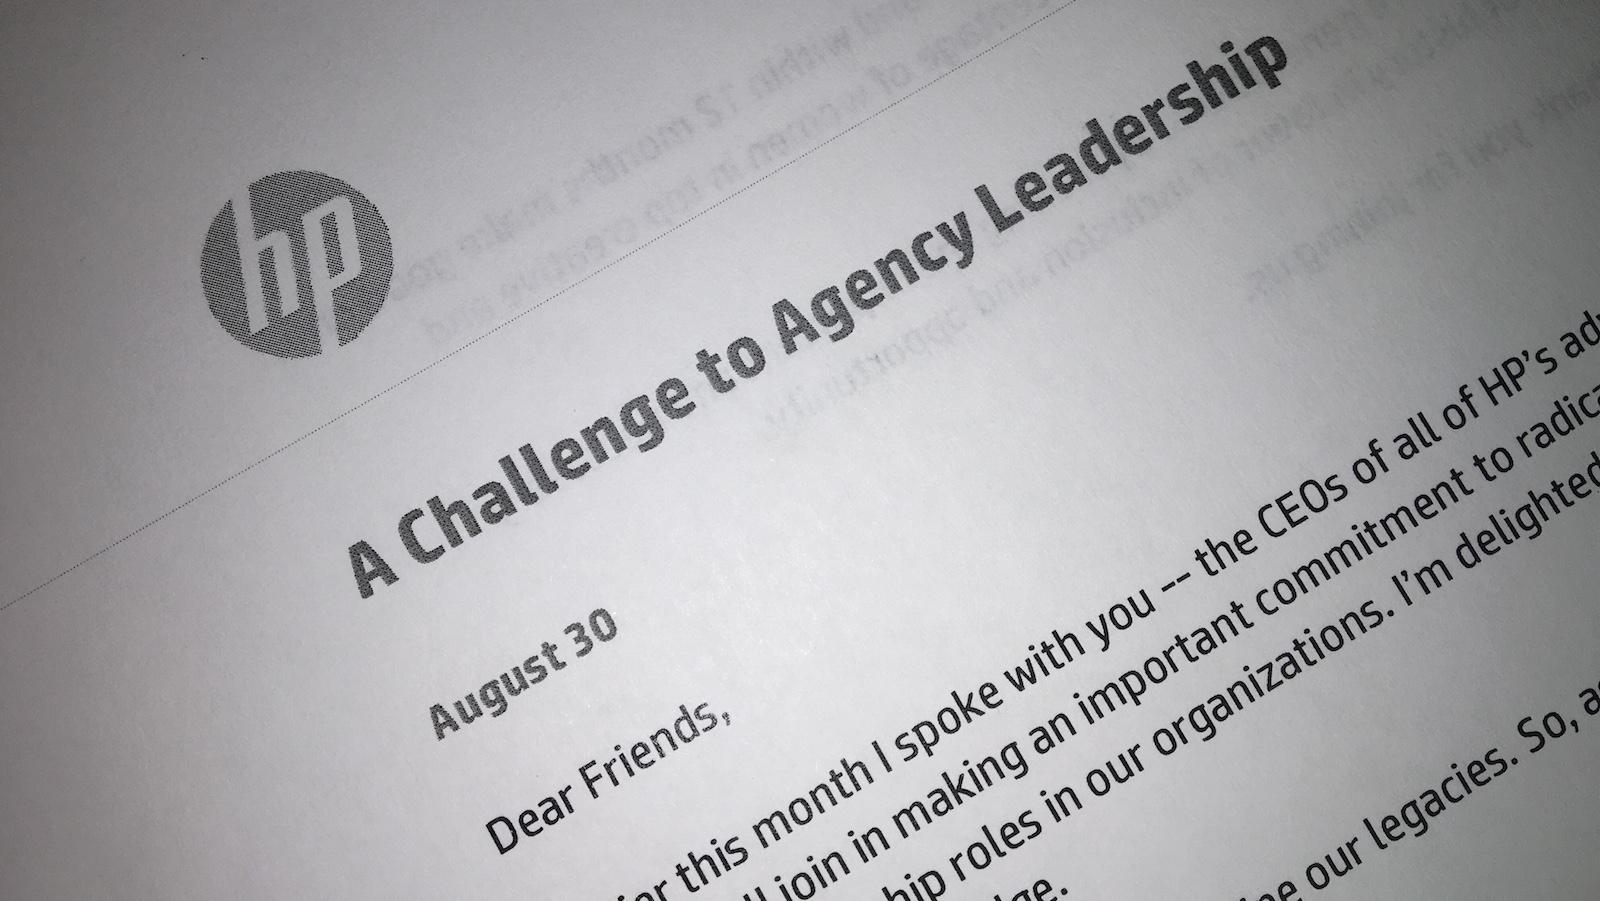 Hewlett-Packard wrote to its agency partners demanding diversity